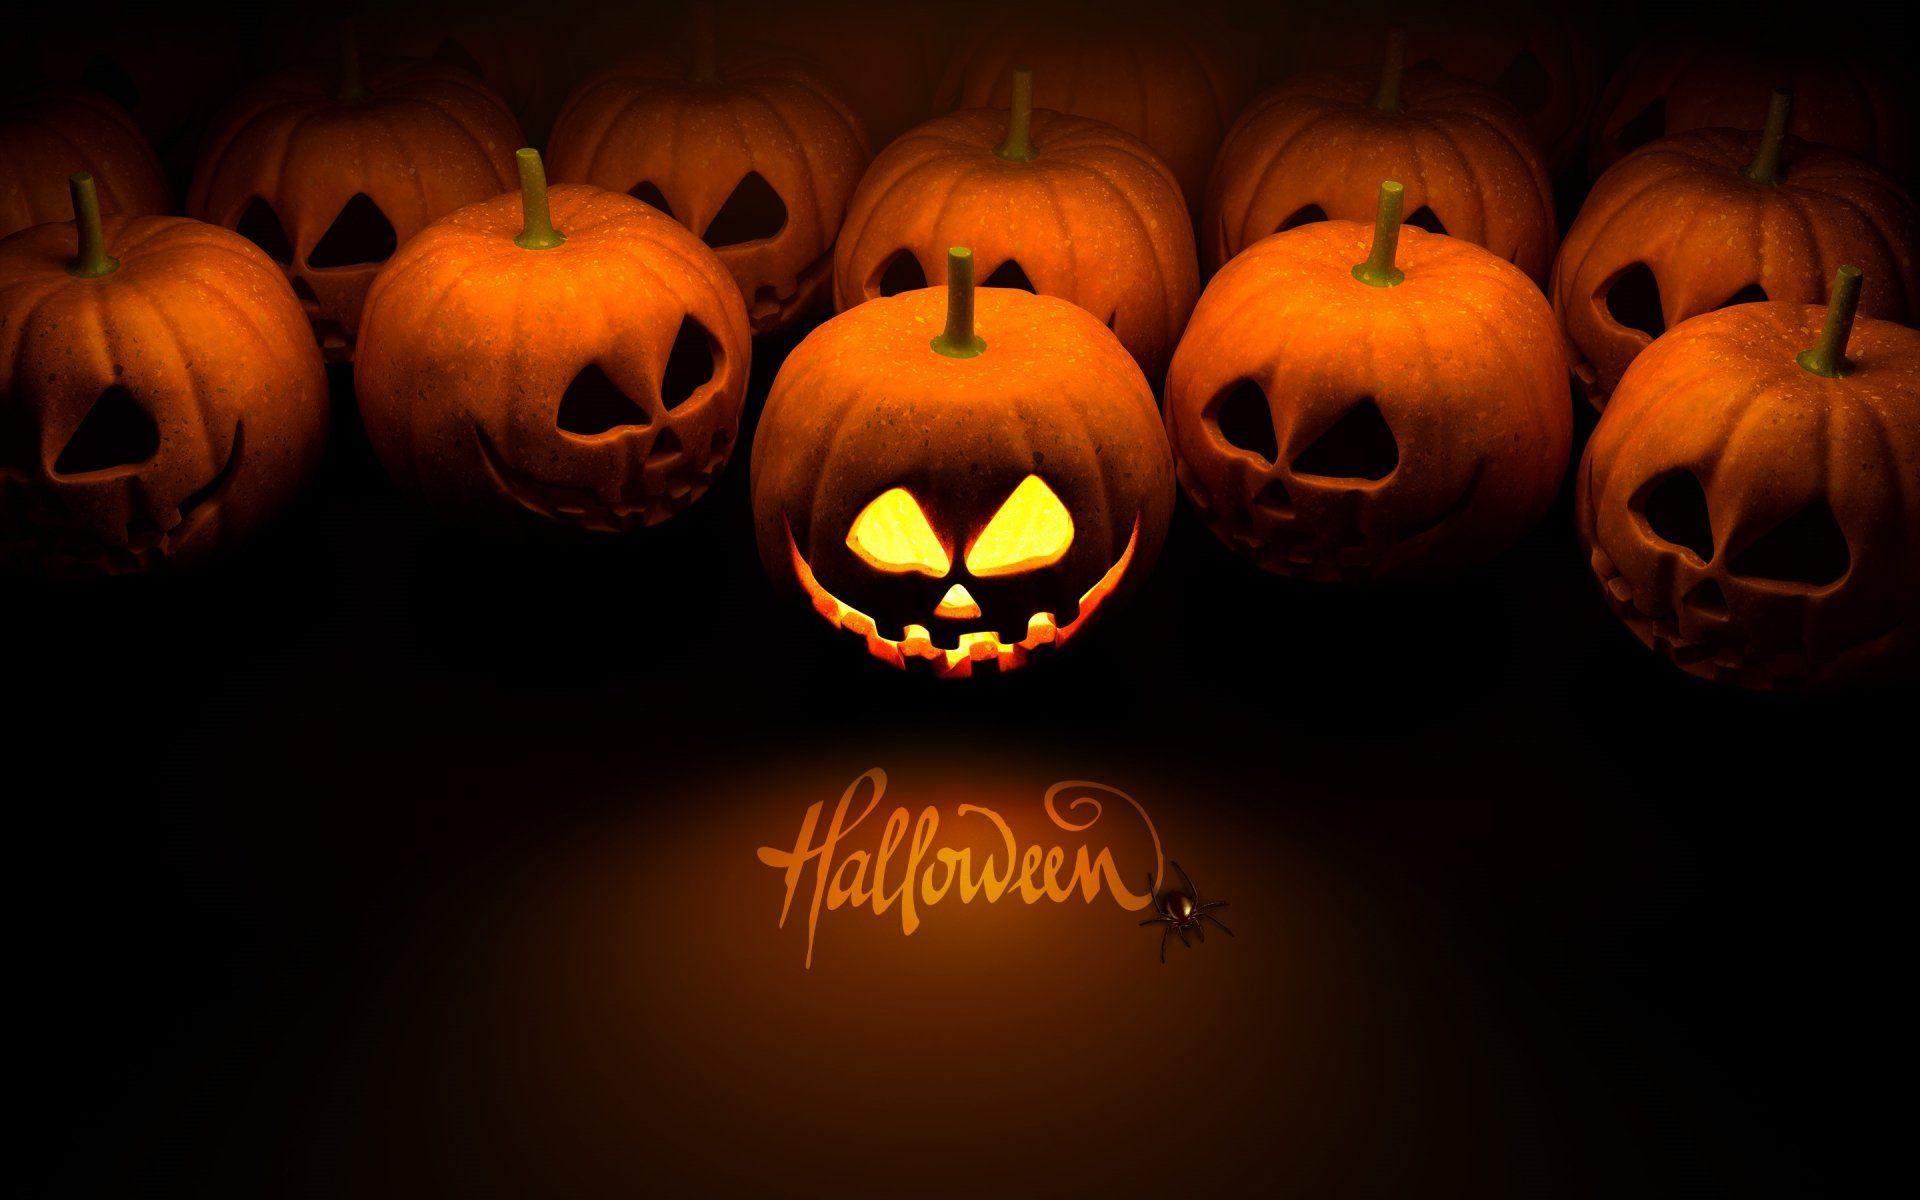 Holiday Halloween Holiday Jack O Lantern Wallpaper Halloween Wallpaper Backgrounds Cute Desktop Wallpaper Wallpaper Backgrounds